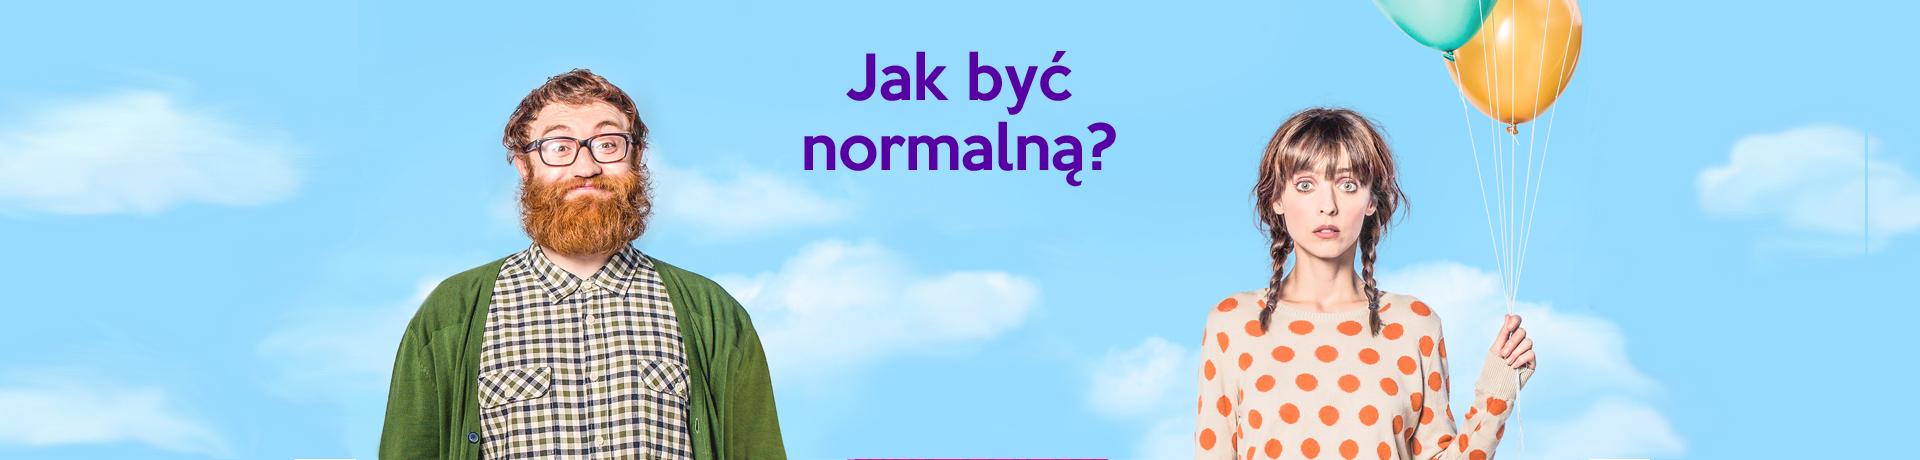 baner_jakbycnormalna-kopia